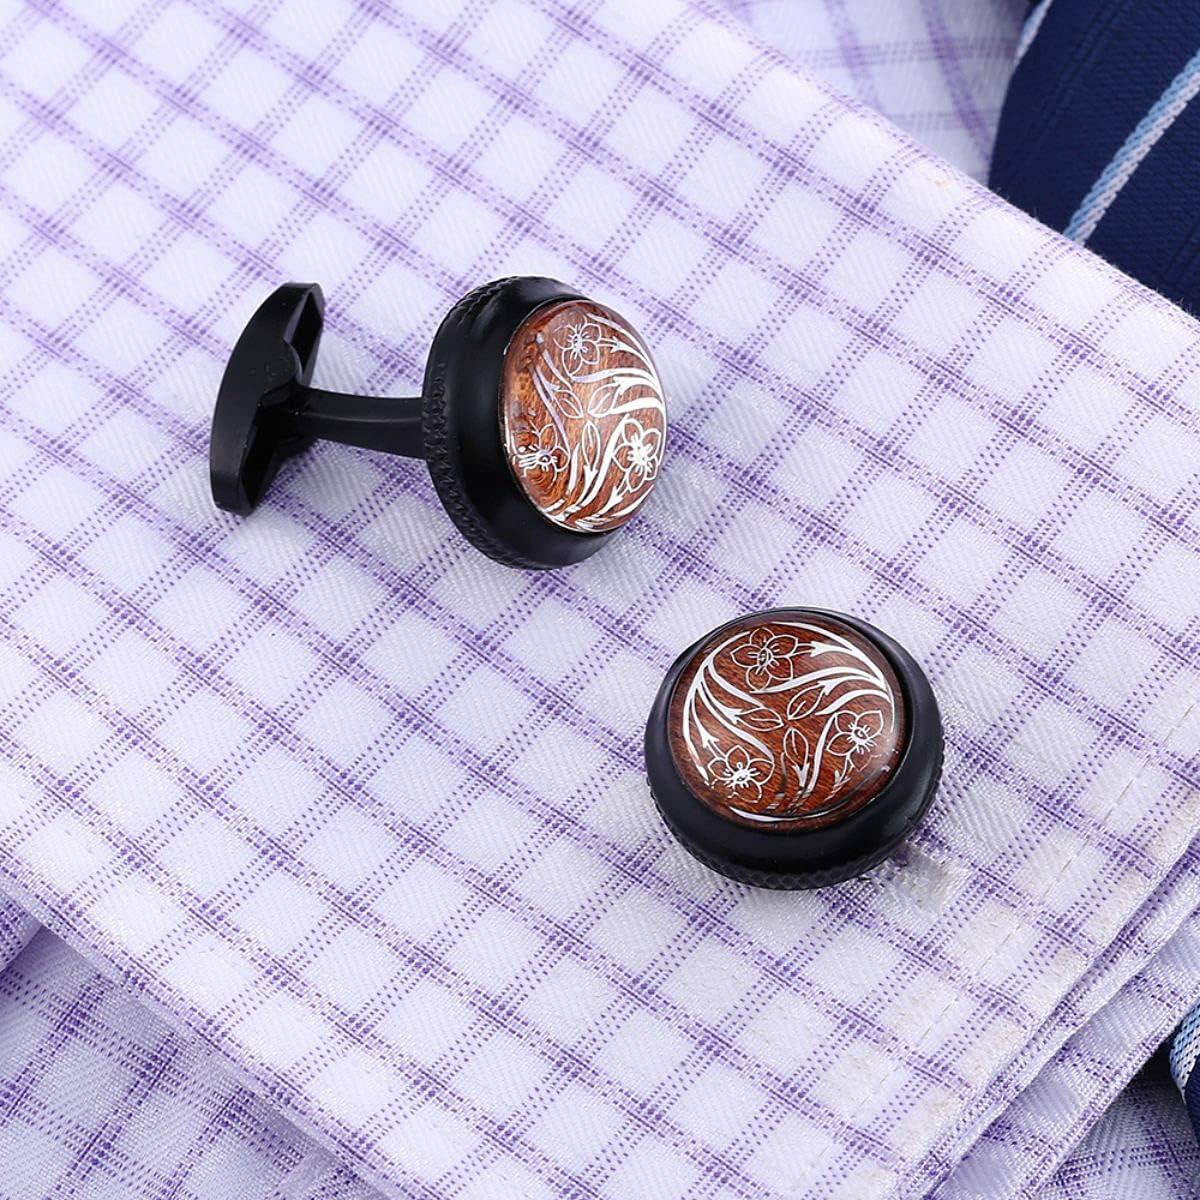 BO LAI DE Mens Cufflinks Black Wood Pattern Round Cuff Links Shirt Cufflinks Suitable for Wedding Business Luxury Tuxedo Formal Shirts, with Gift Box